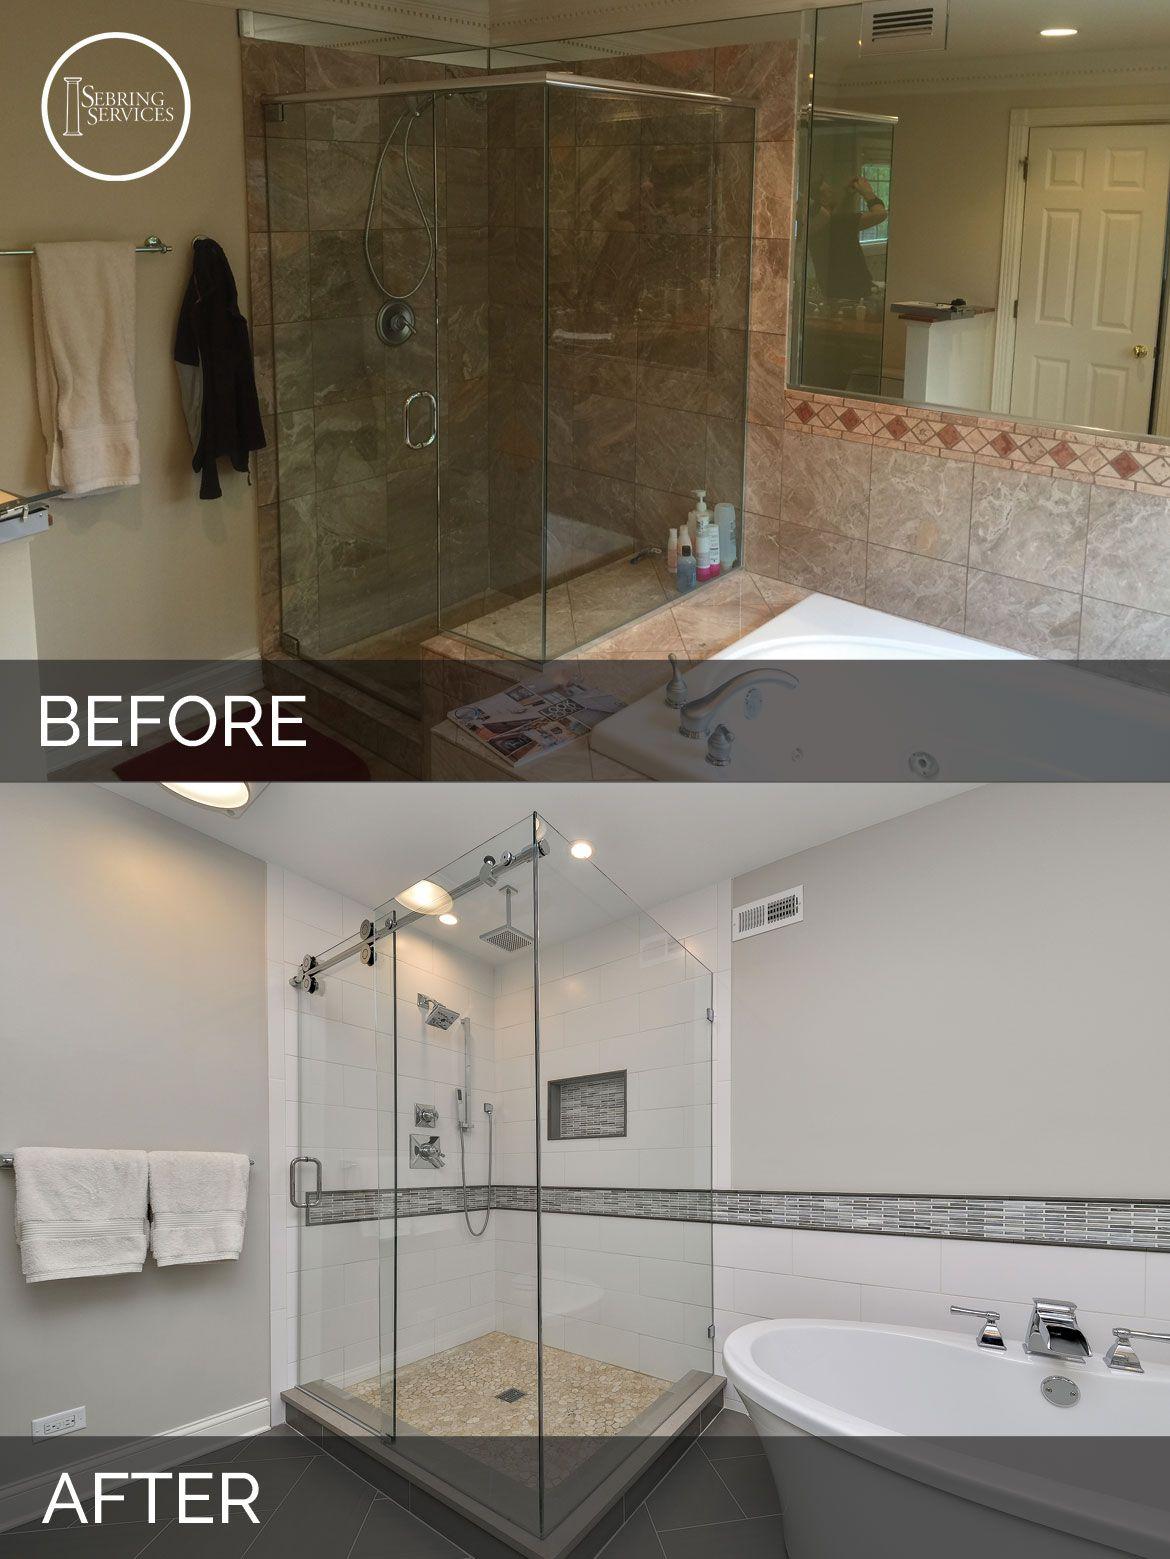 Greg Julie S Master Bathroom Remodel Before After Pictures Bathroom Remodel Master Bathrooms Remodel Beautiful Bathroom Decor